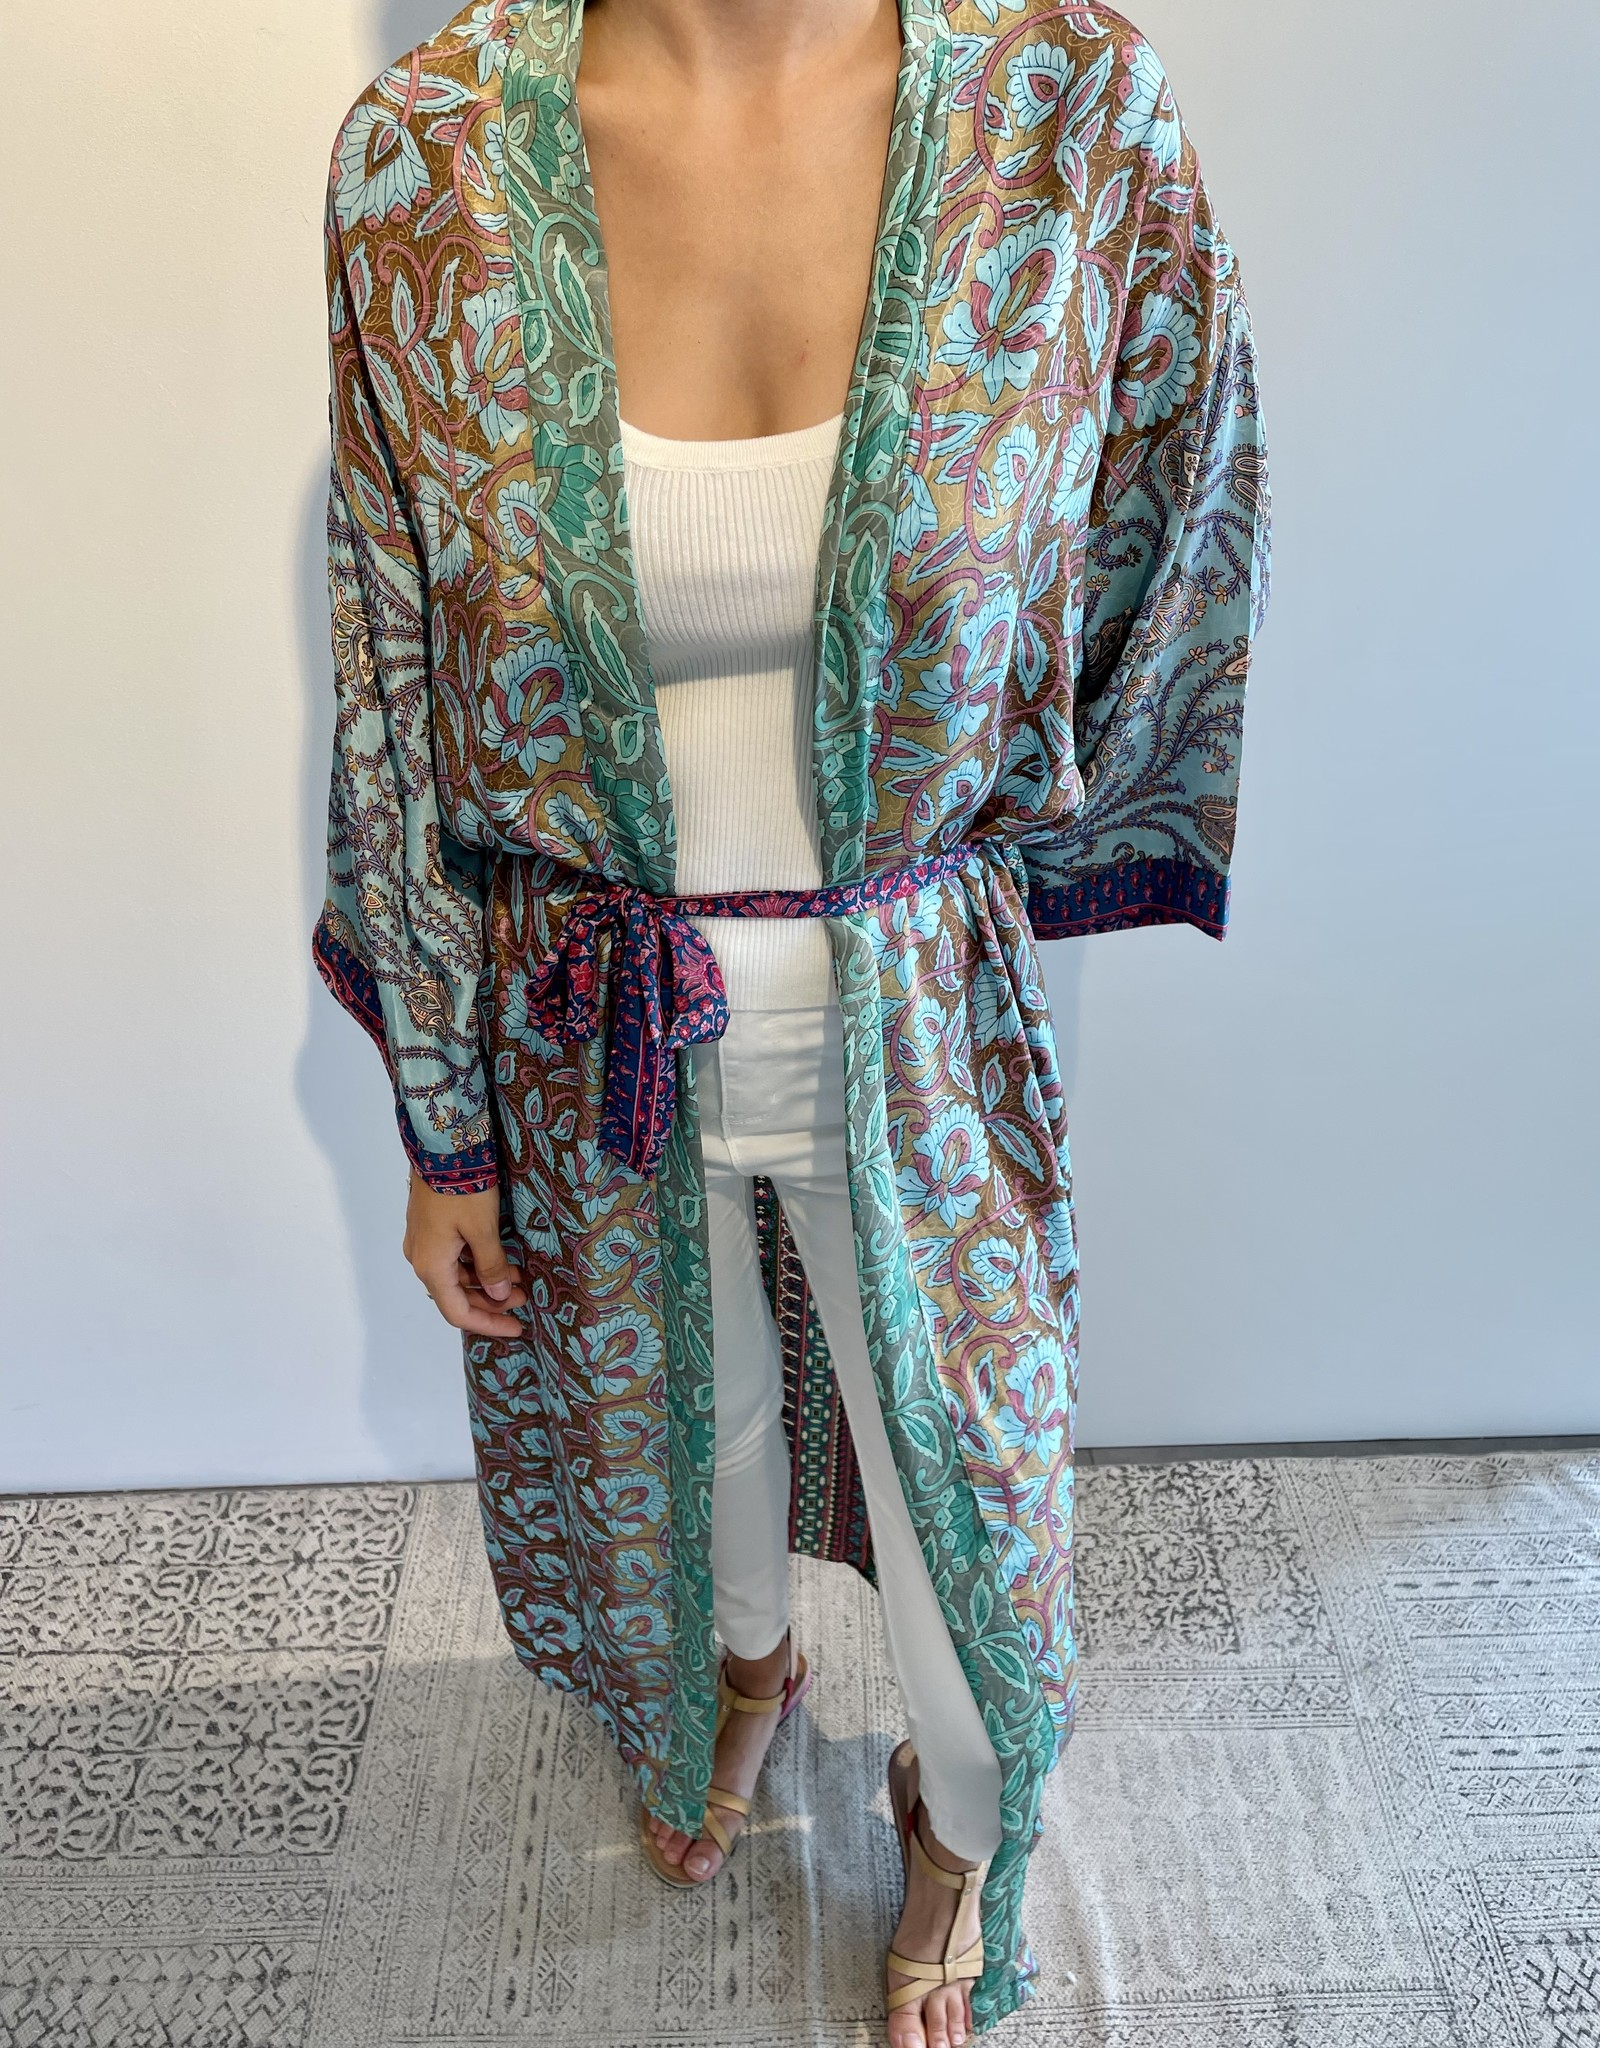 Kimono Kura - prix rond